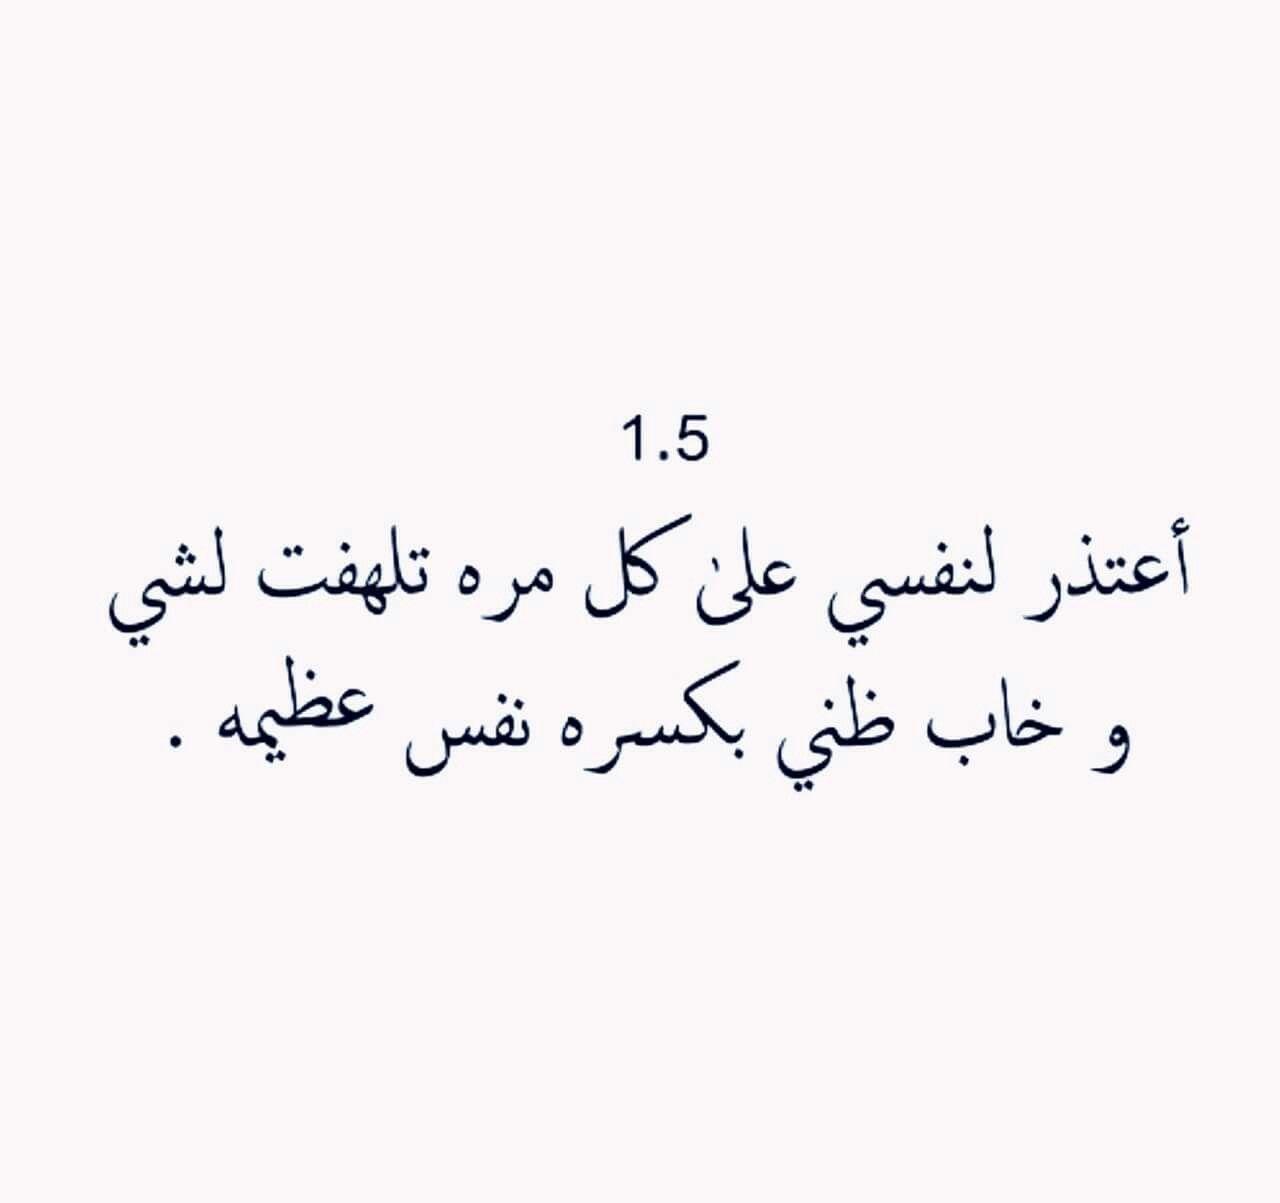 اعتذر لنفسي Words Arabic Love Quotes Love Quotes